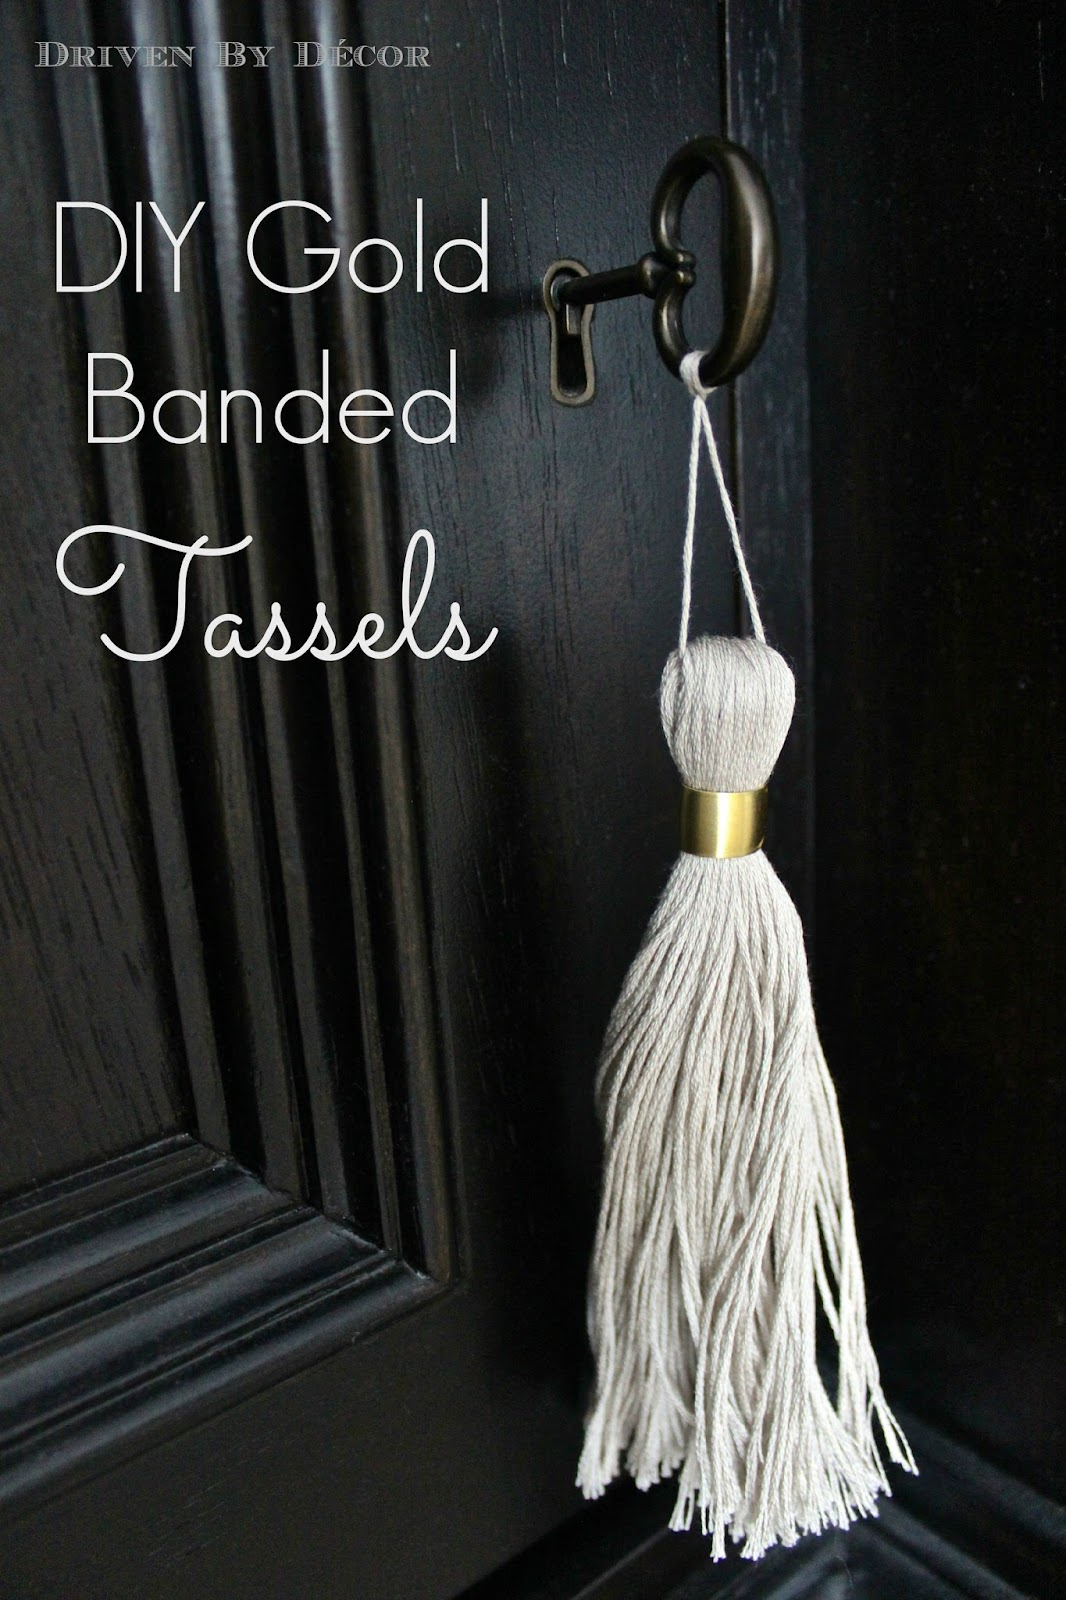 a furniture tassel how to diy gold banded tassels driven by decor. Black Bedroom Furniture Sets. Home Design Ideas